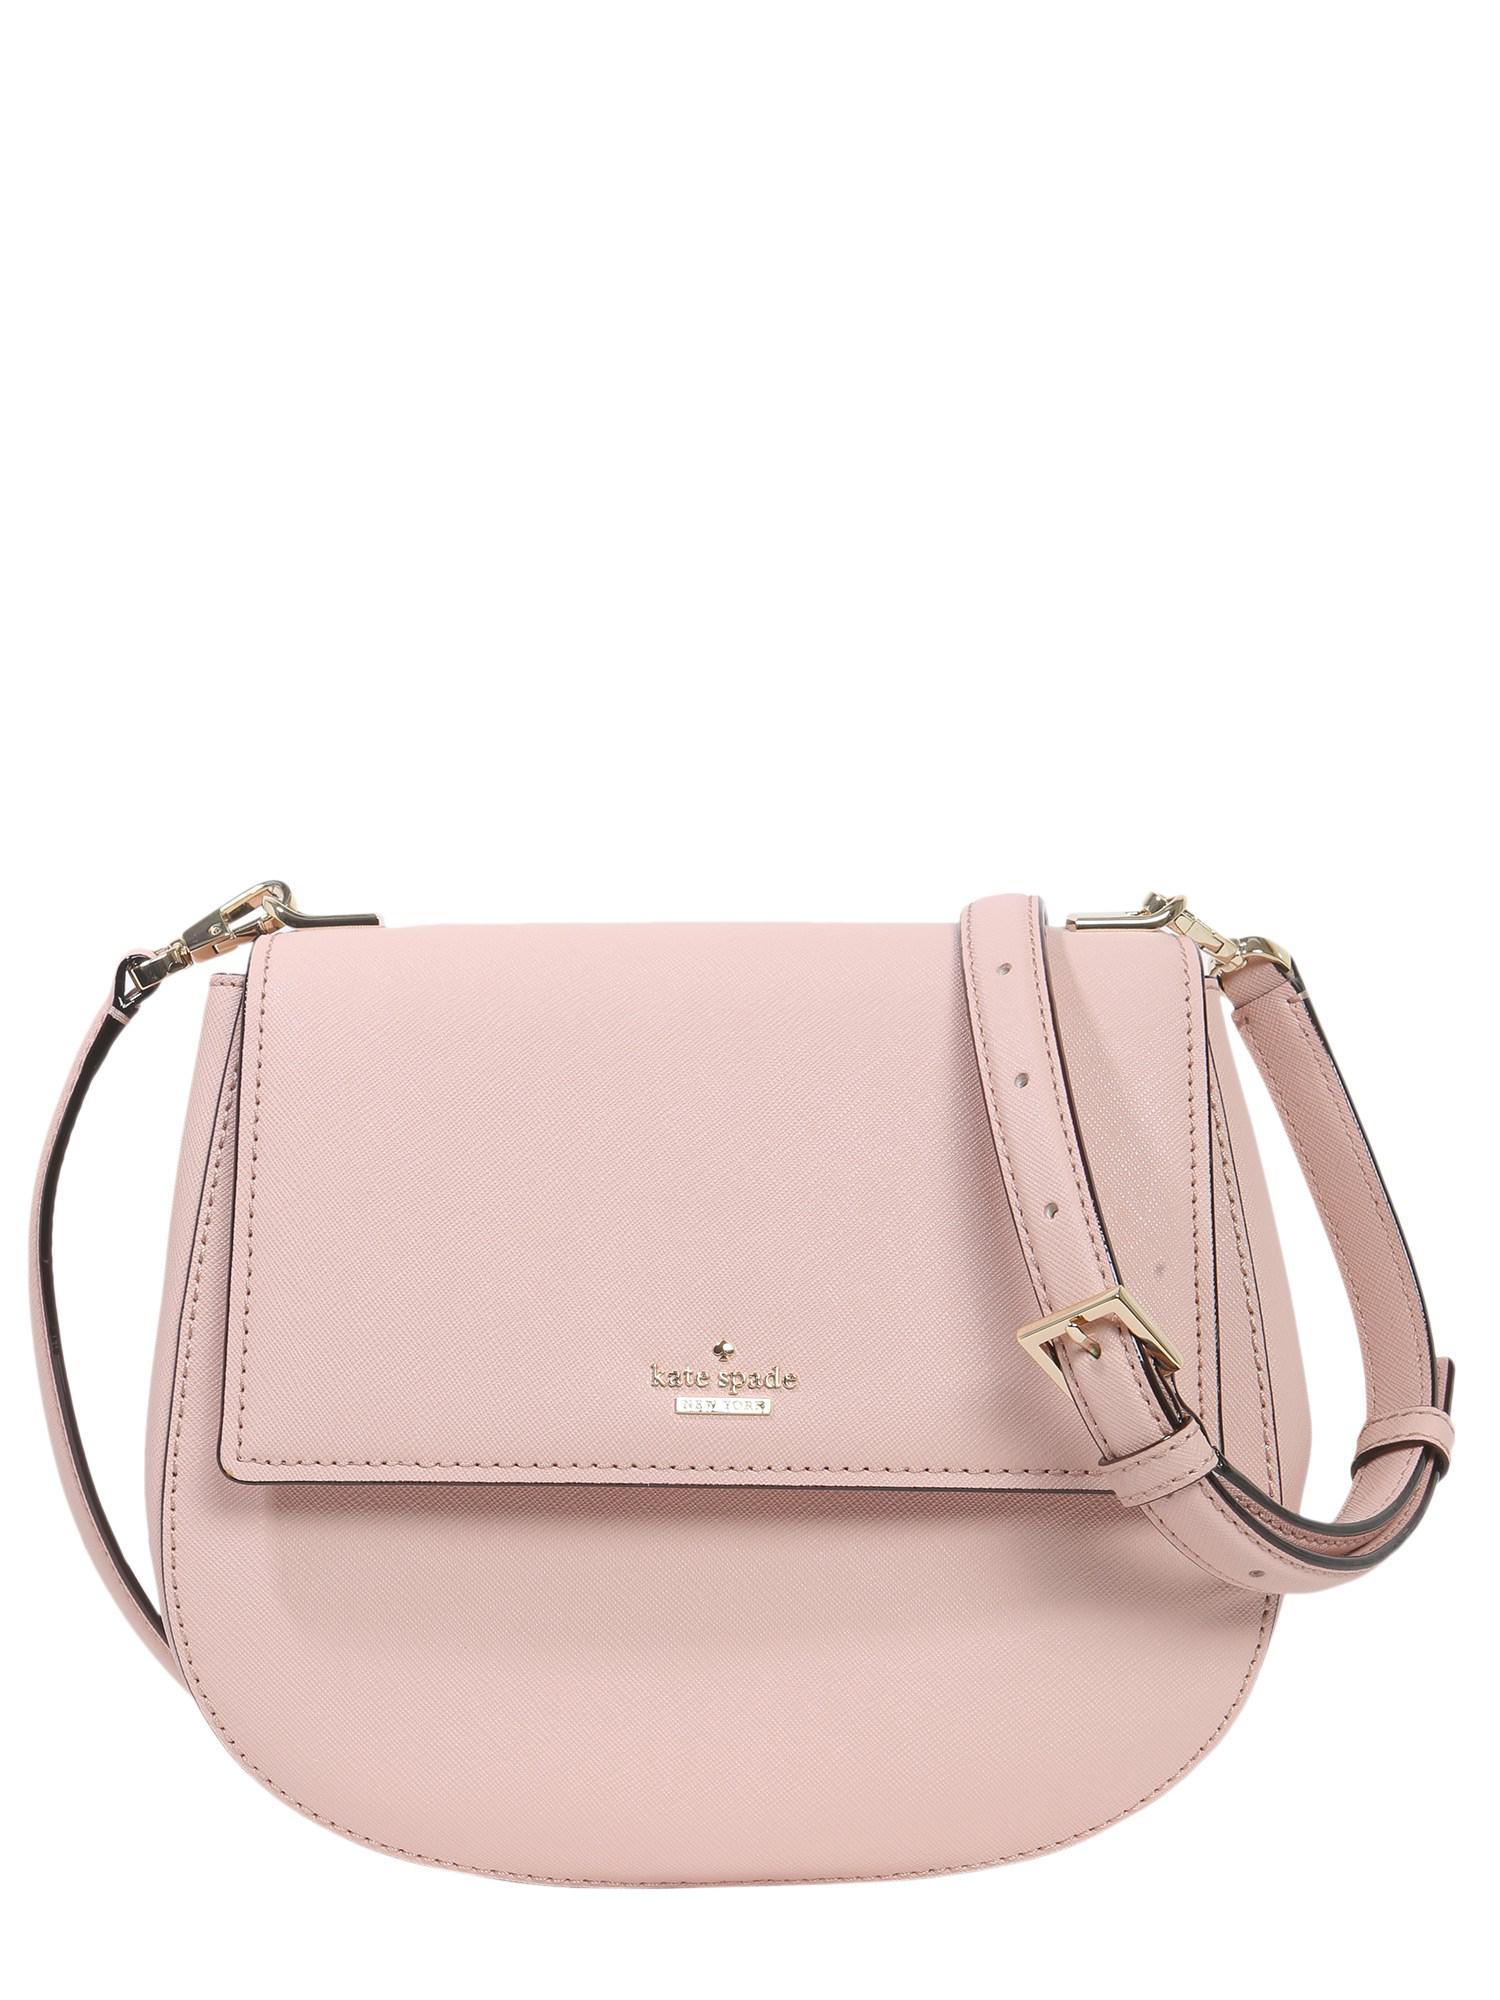 Kate Spade Women S Pink Cameron Street Byr Leather Crossbody Bag